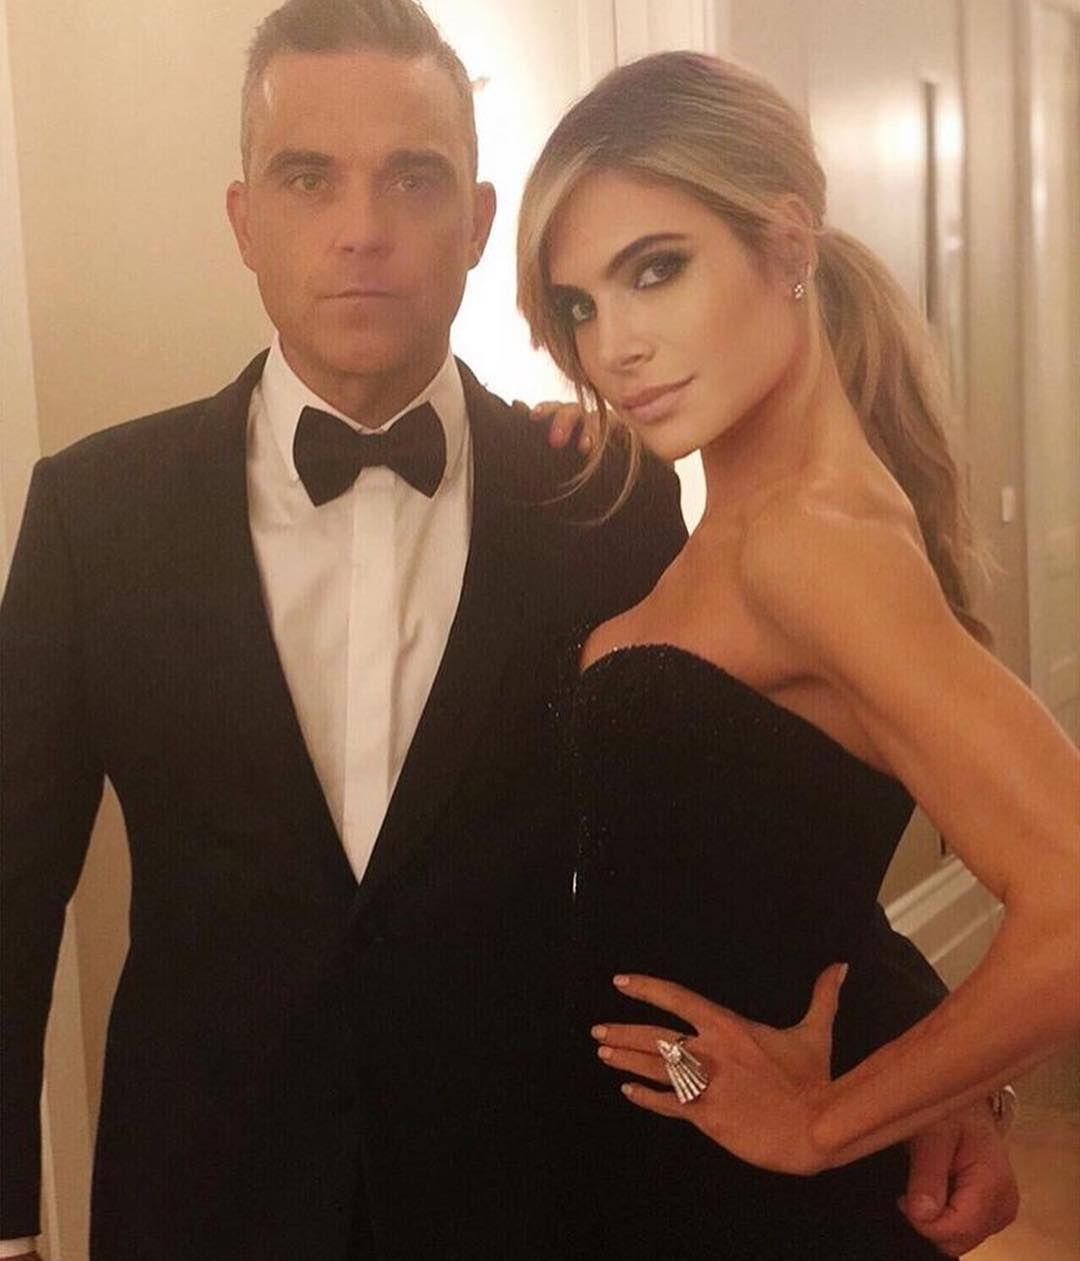 Robbie Williams And Ayda Field Foryourroyalinformation Royalwedding Princesseugenie Jackbrooksbank Konigliche Hochzeit Prinzessin Eugenie Robbie Williams